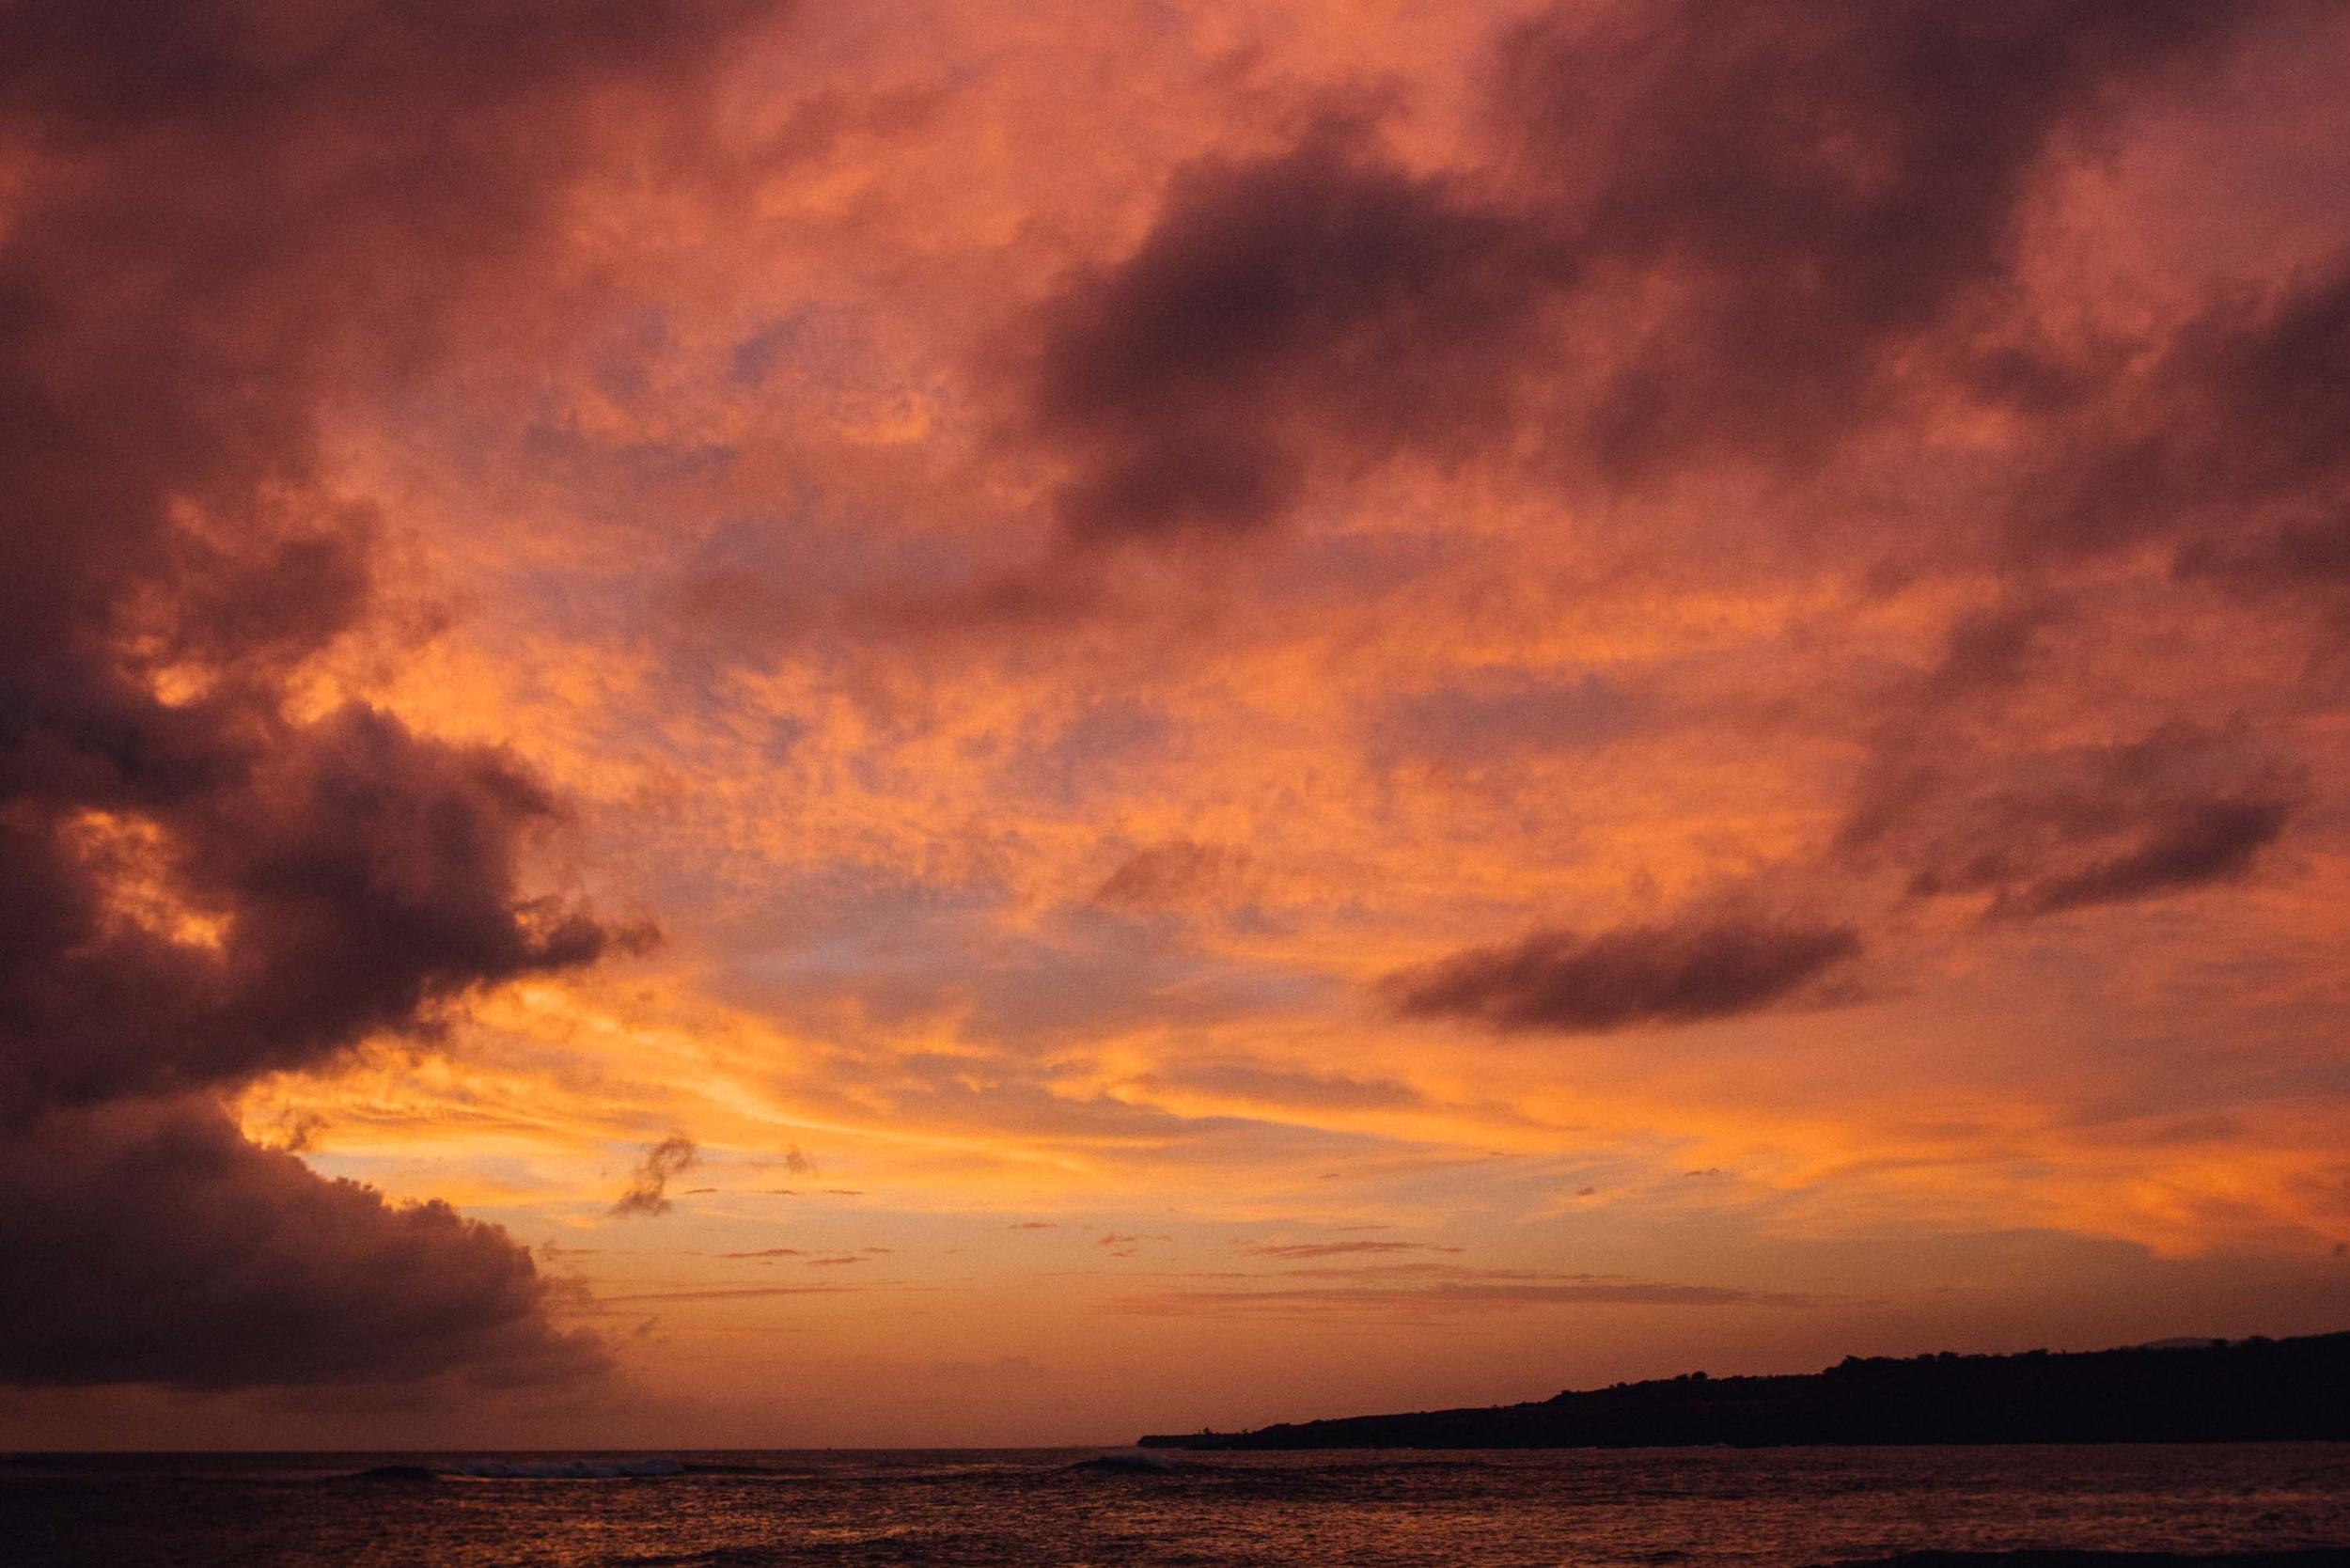 bryce-johnson-kauai-fj40-toyota-landcruiser-aloha exchange-slowtide-17.jpg